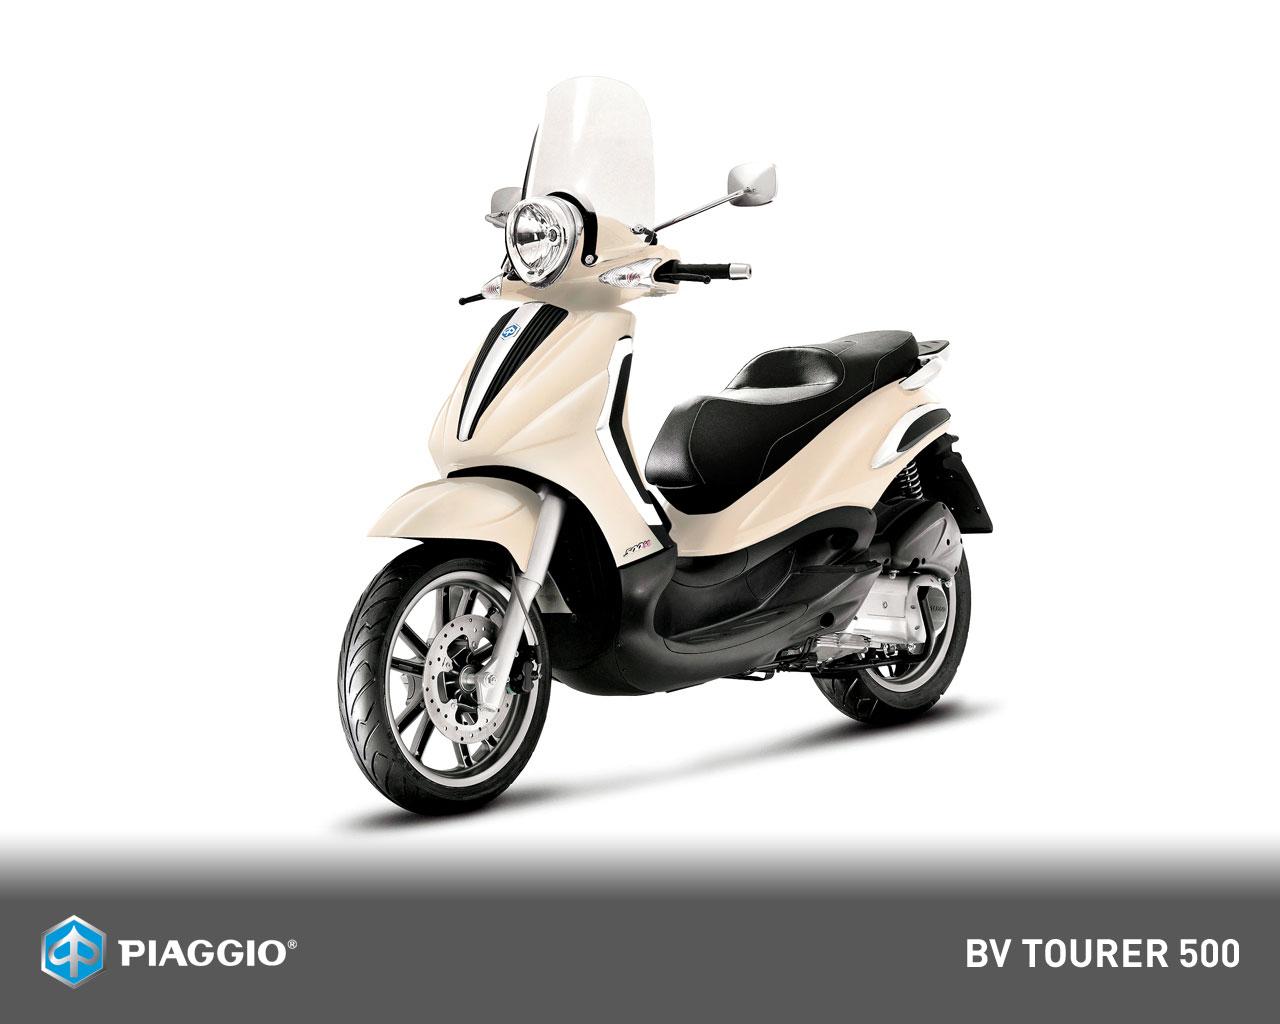 piaggio bv tourer 500 specs - 2008, 2009 - autoevolution